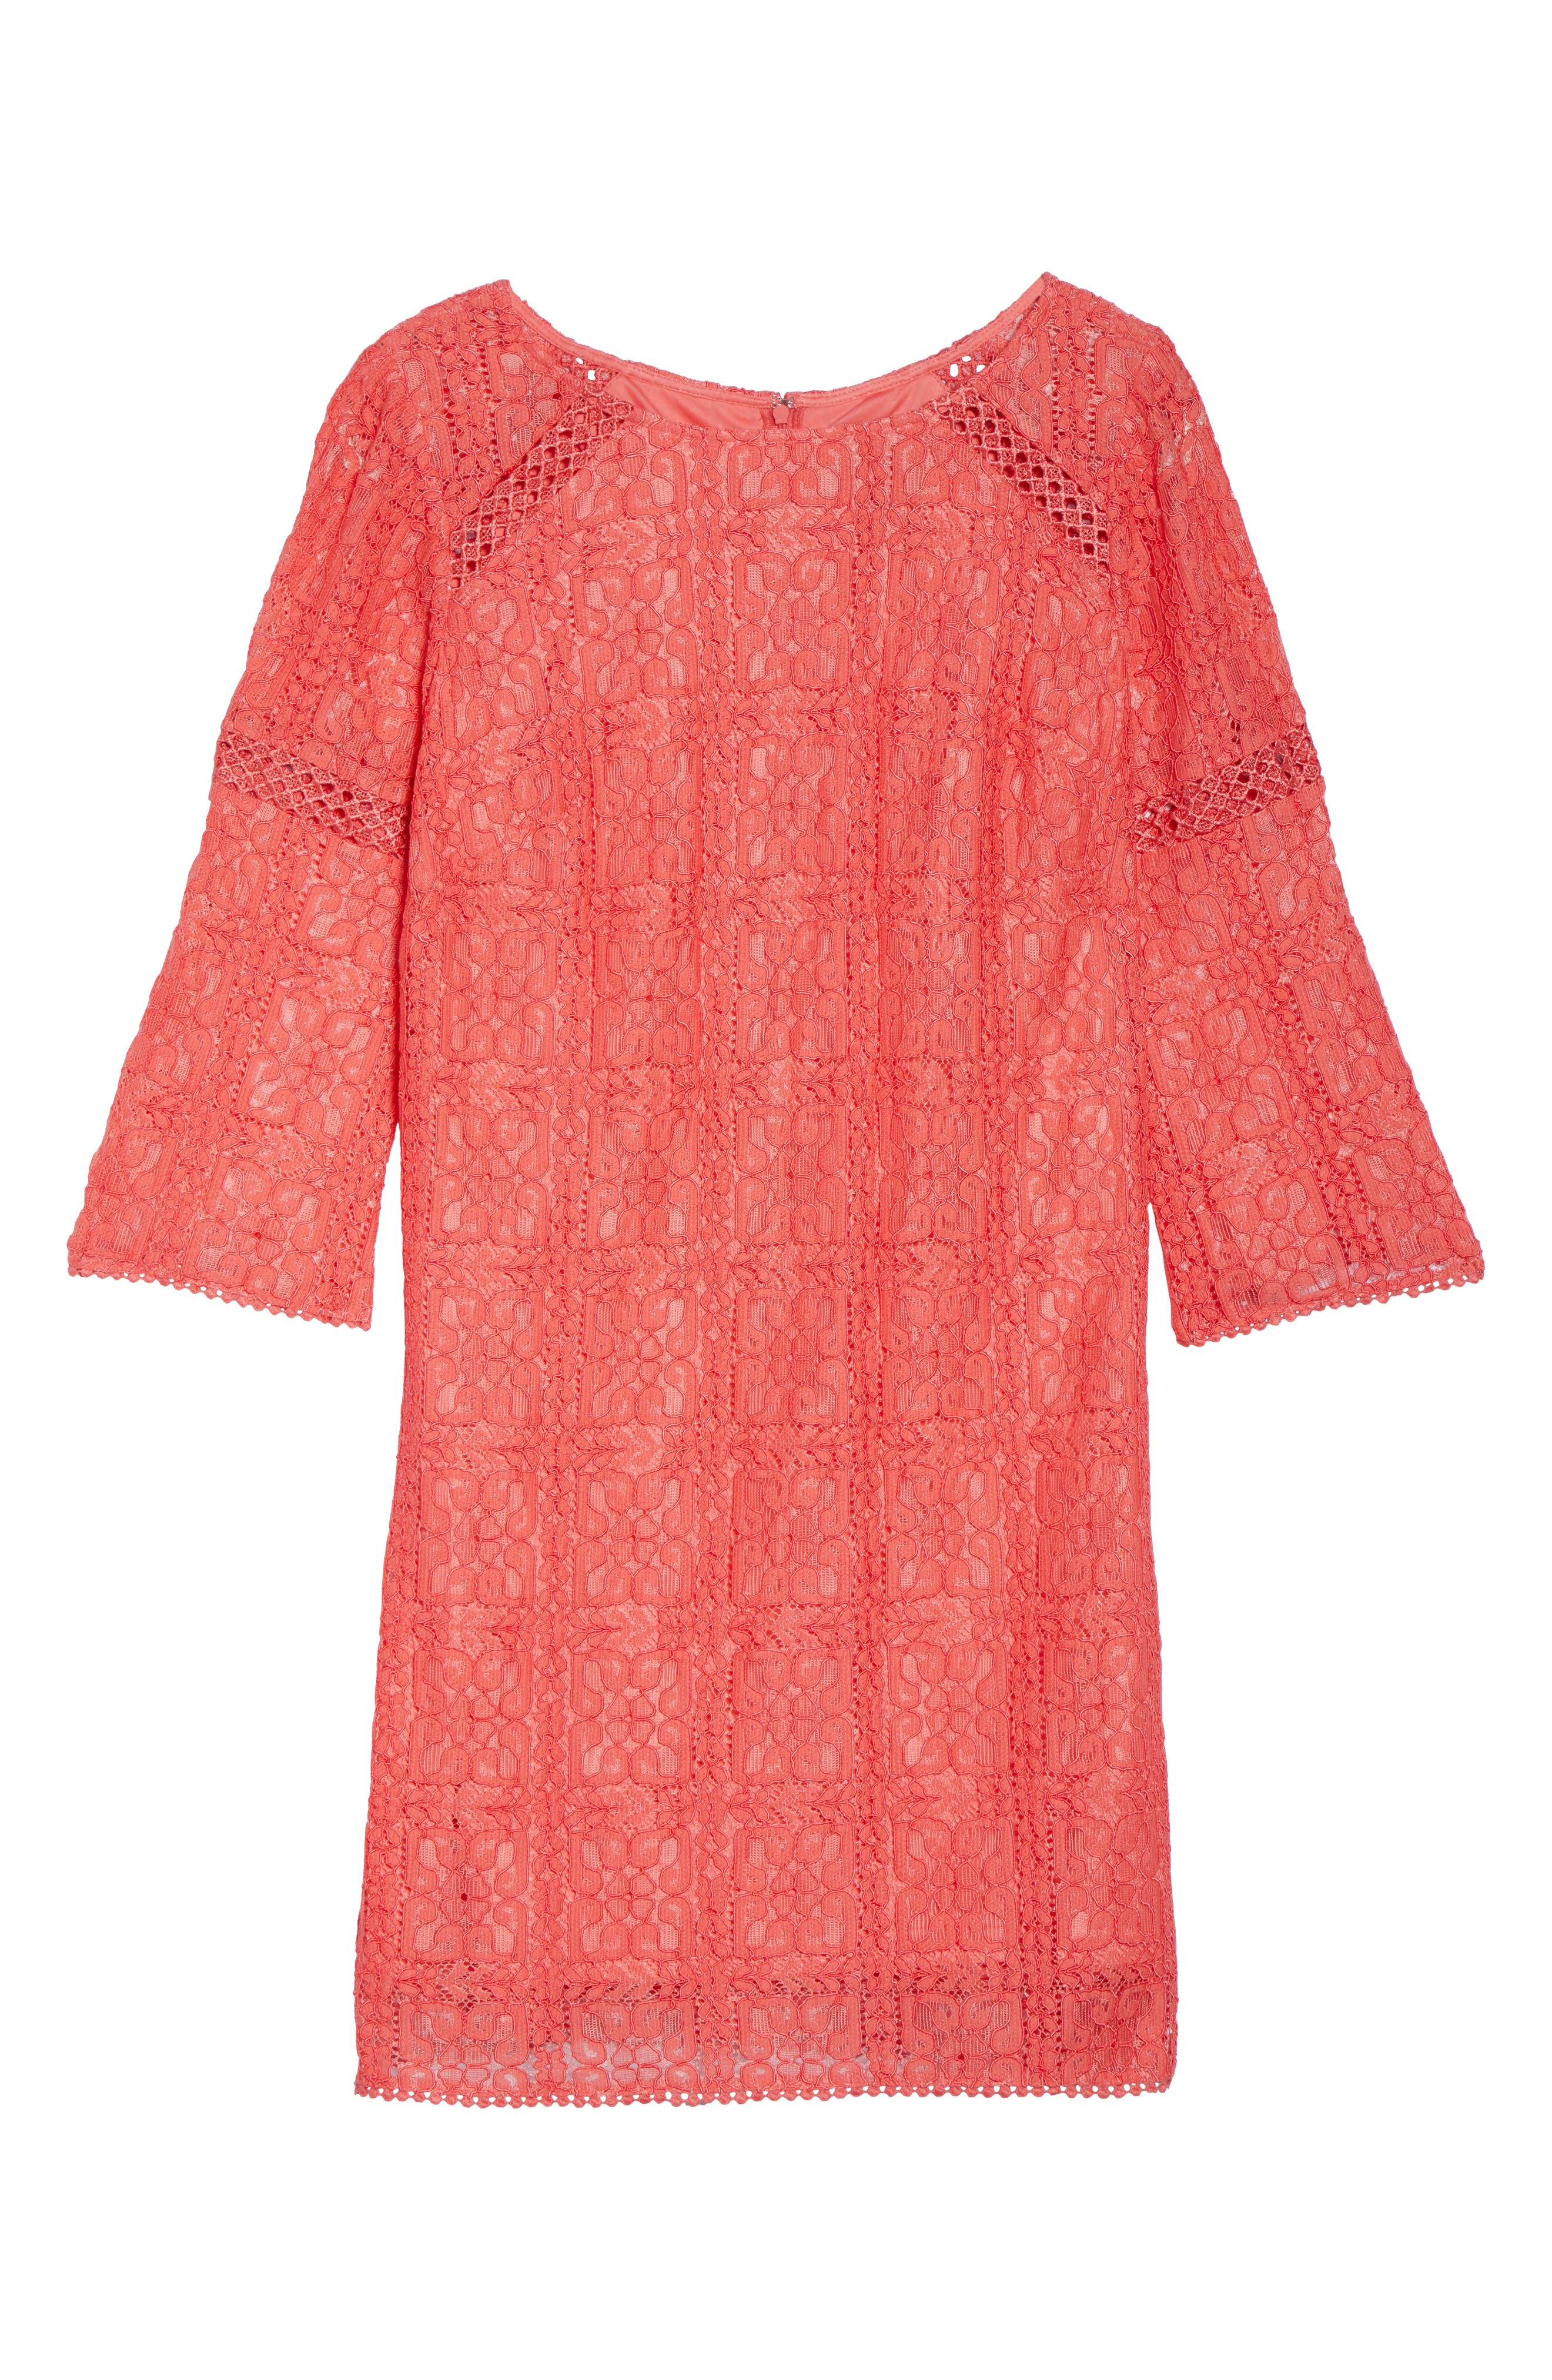 Marni Lace Shift Dress,                             Alternate thumbnail 6, color,                             Cruise Coral